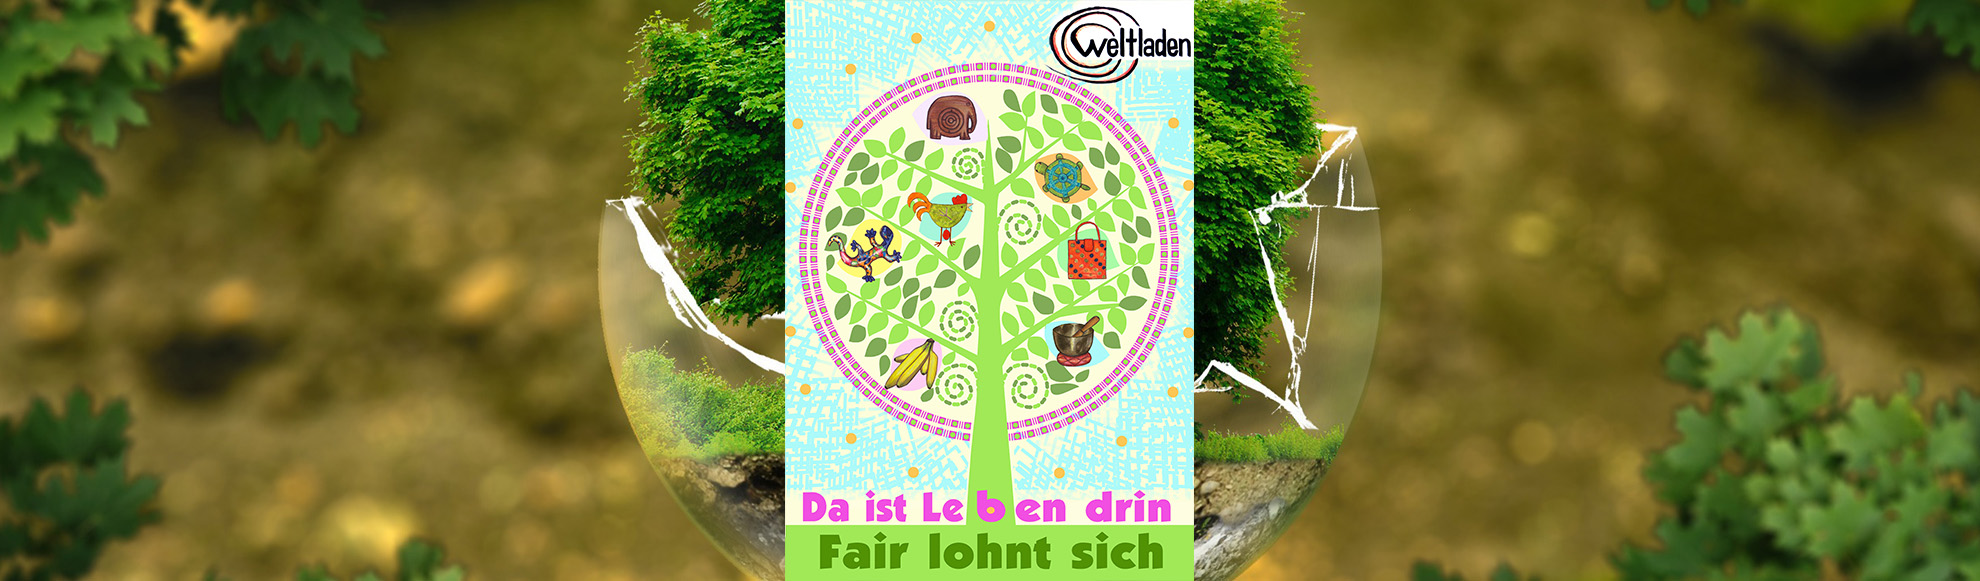 Weltladen Trier